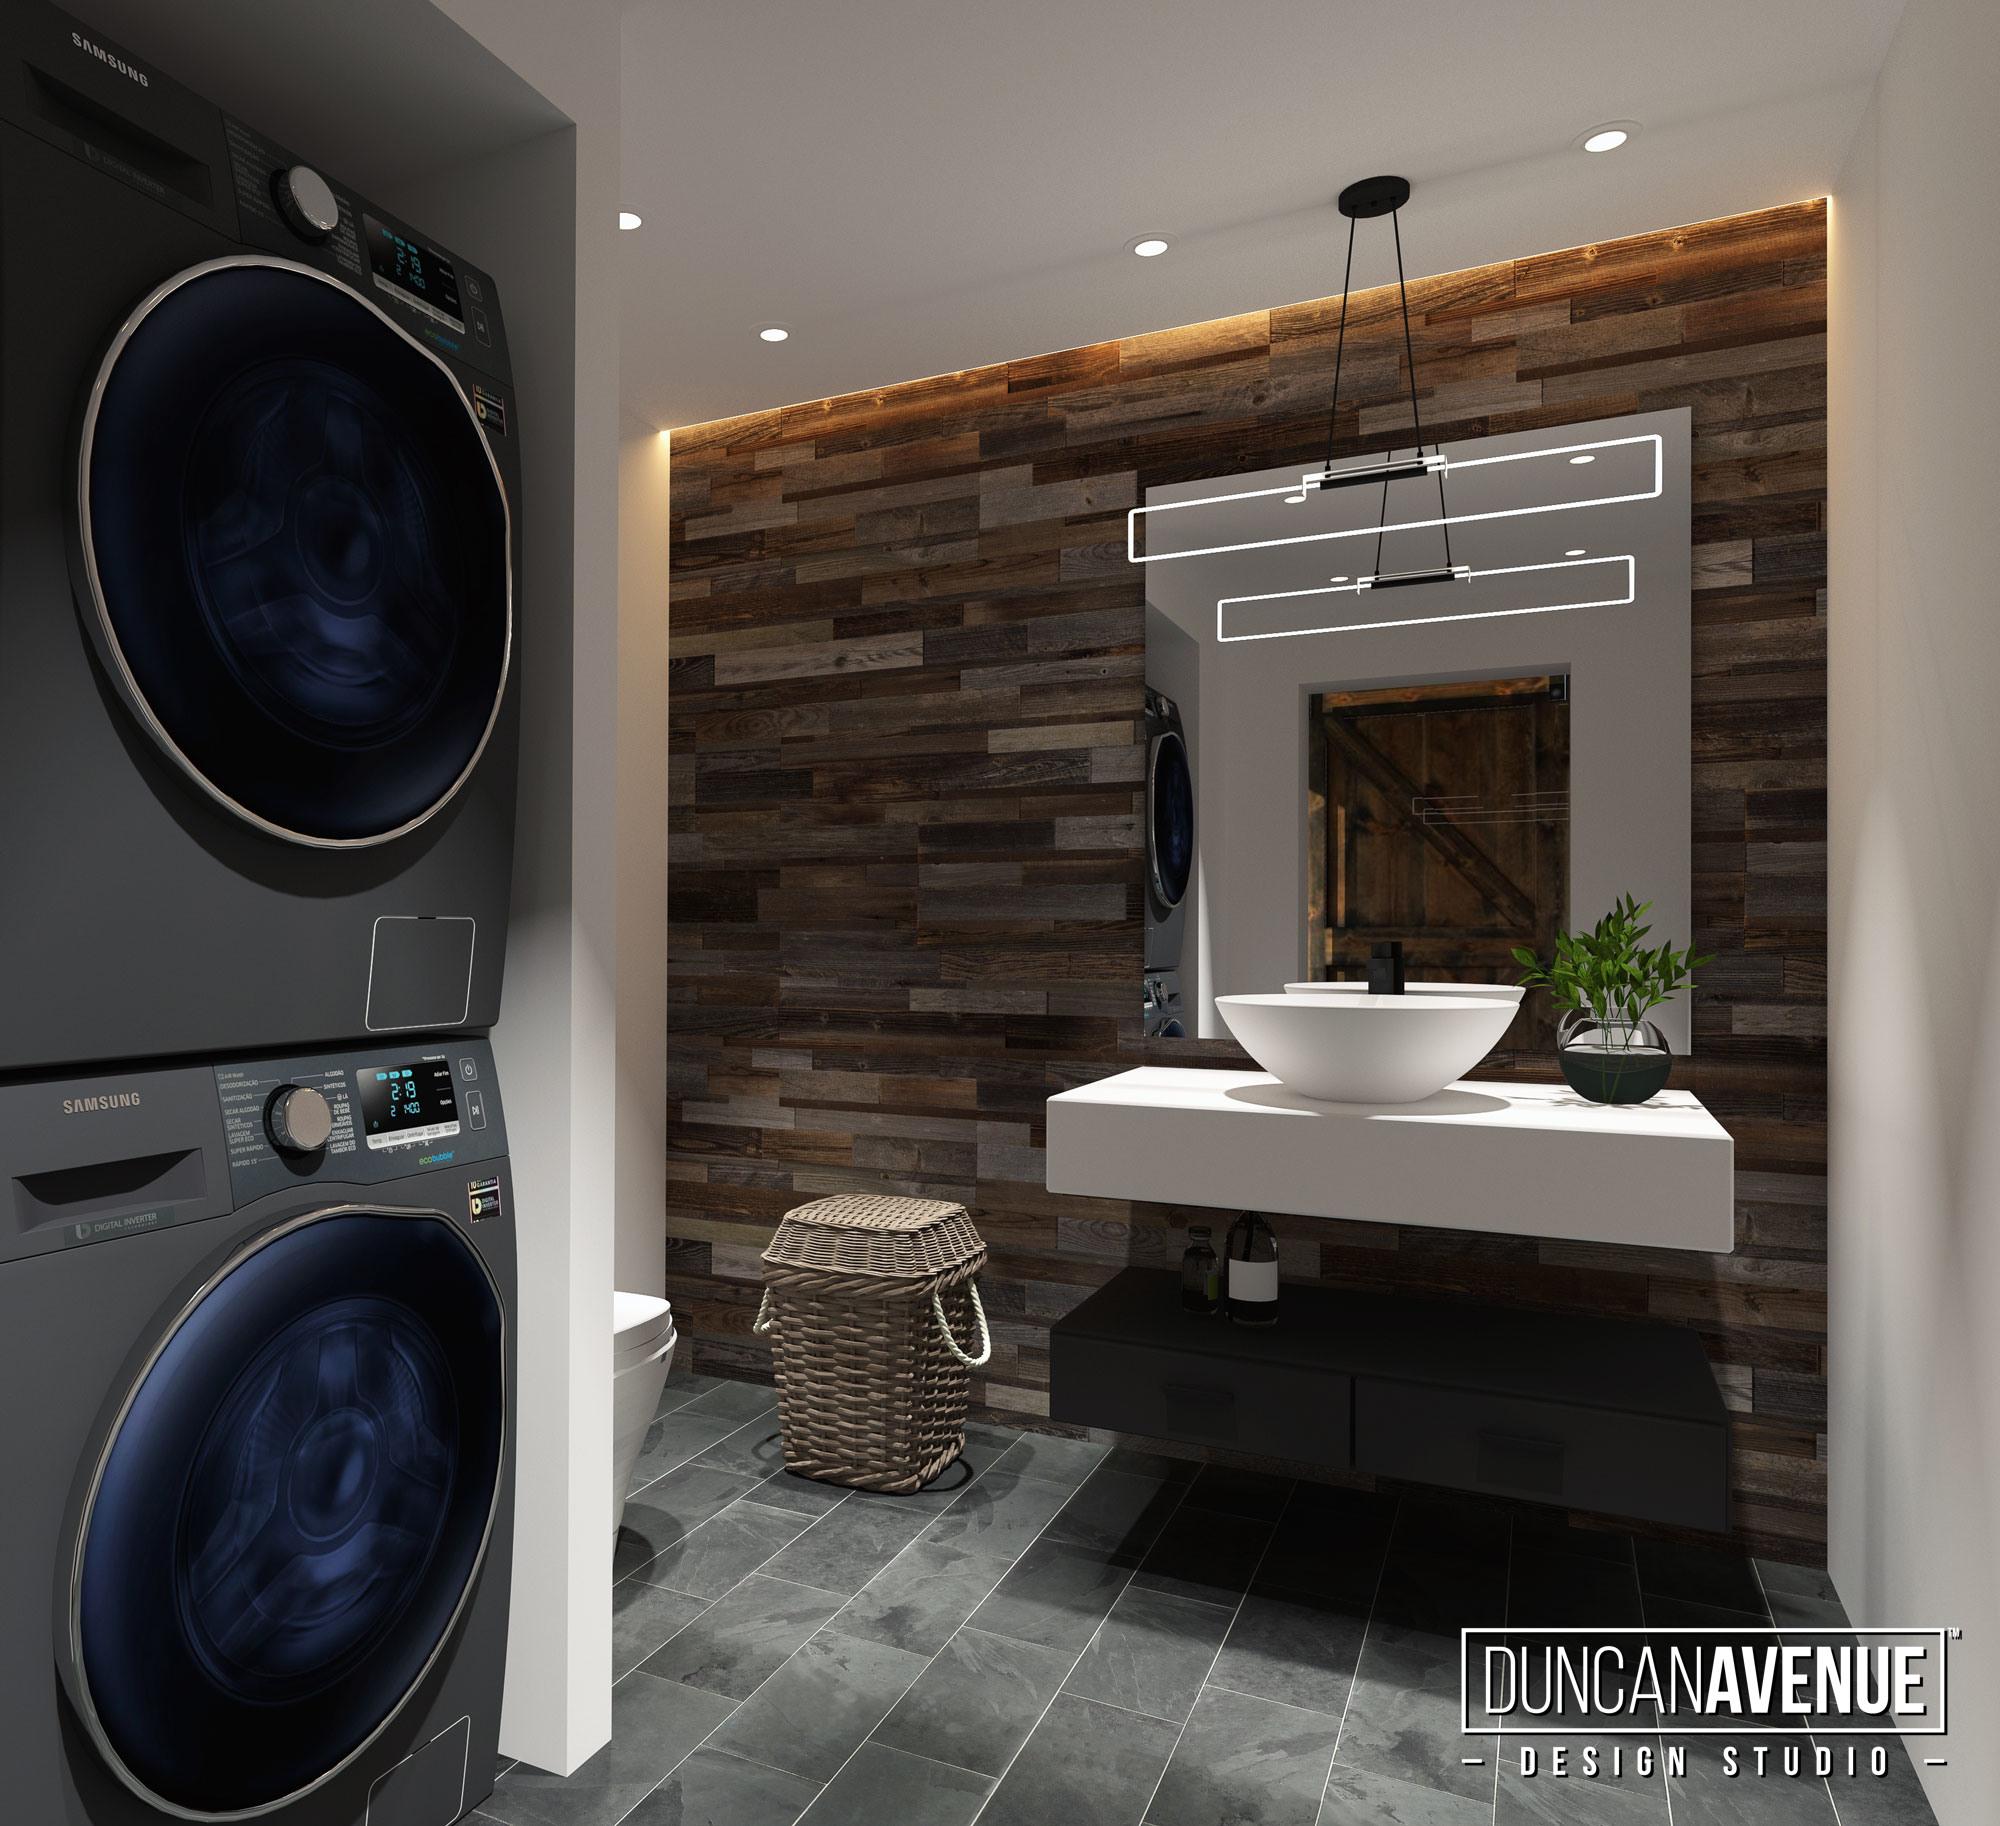 Modern Rustic Style Interior Design by Duncan Avenue Interior Design Studio - Hudson Valley